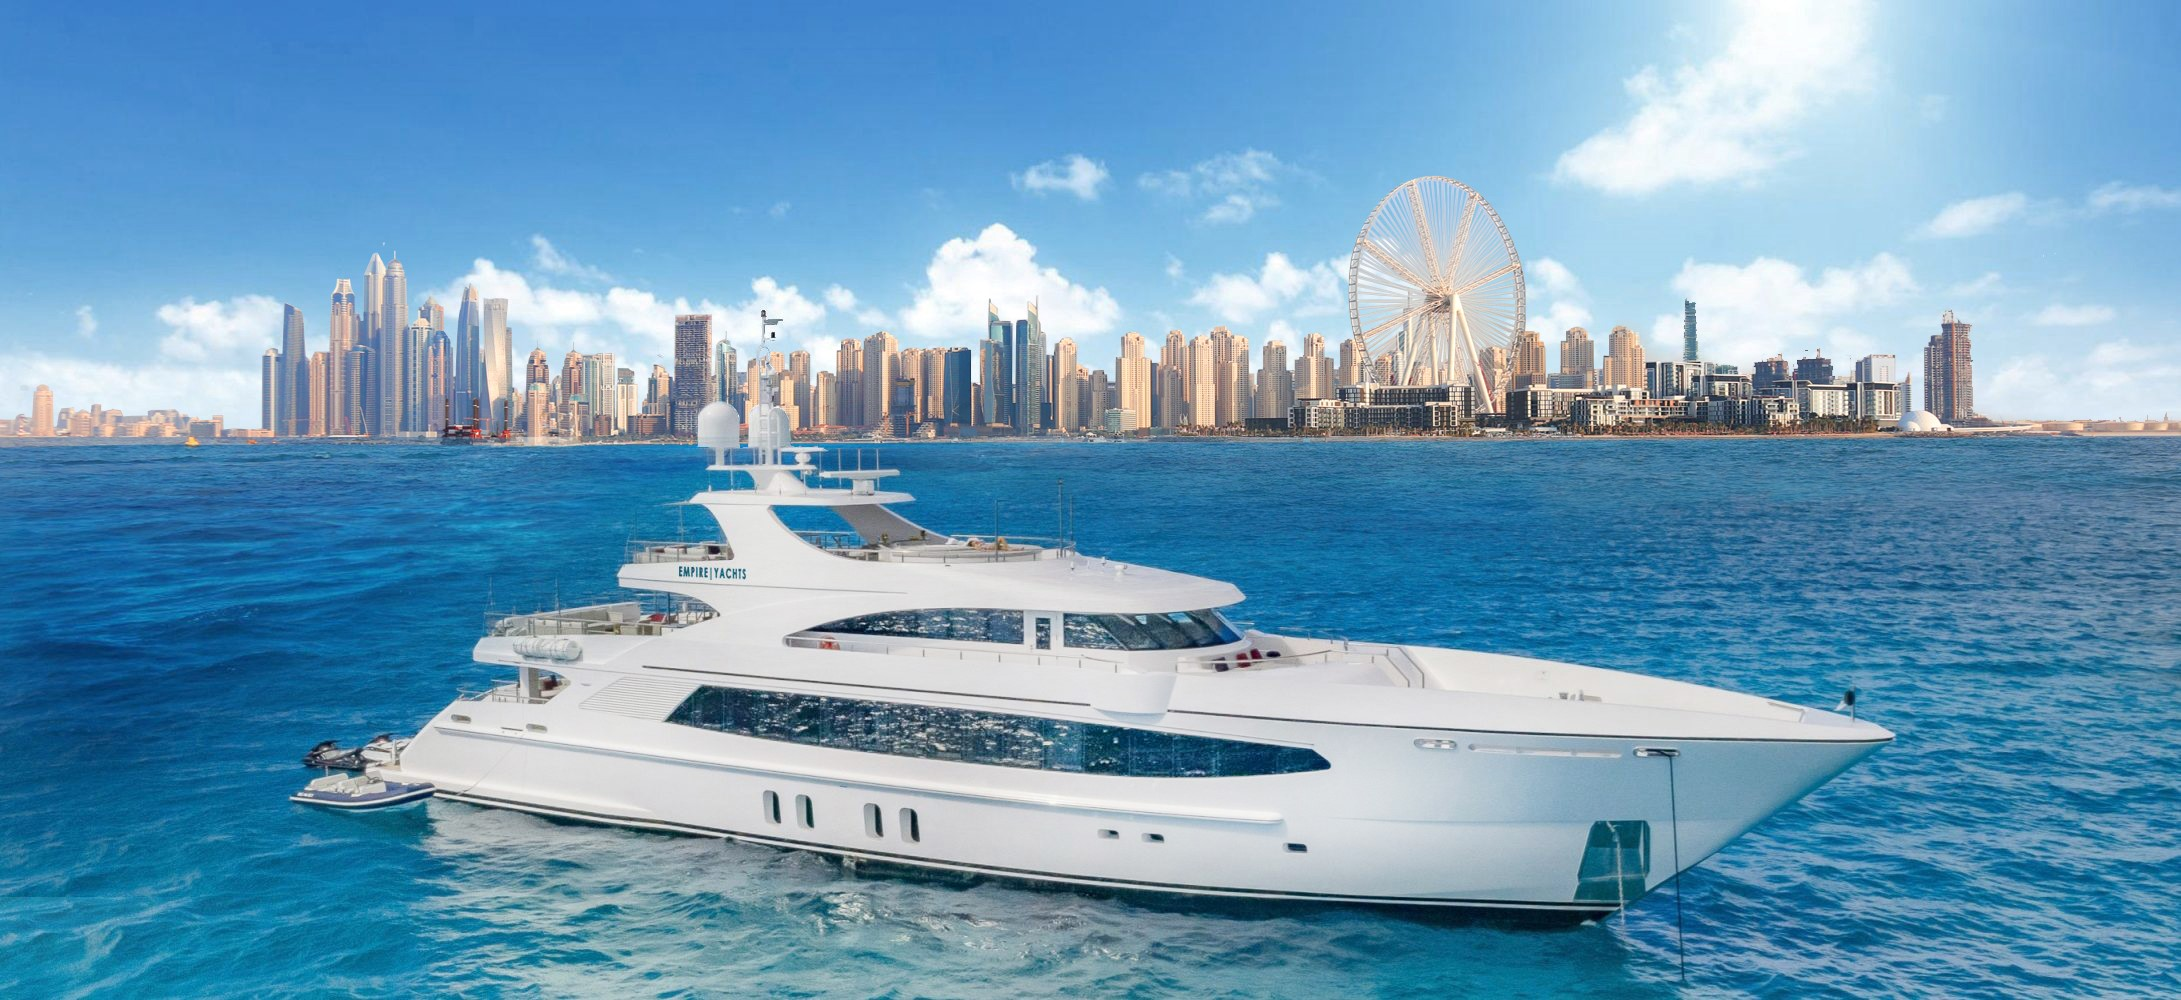 Luxury yacht charter dubai | empire yachts